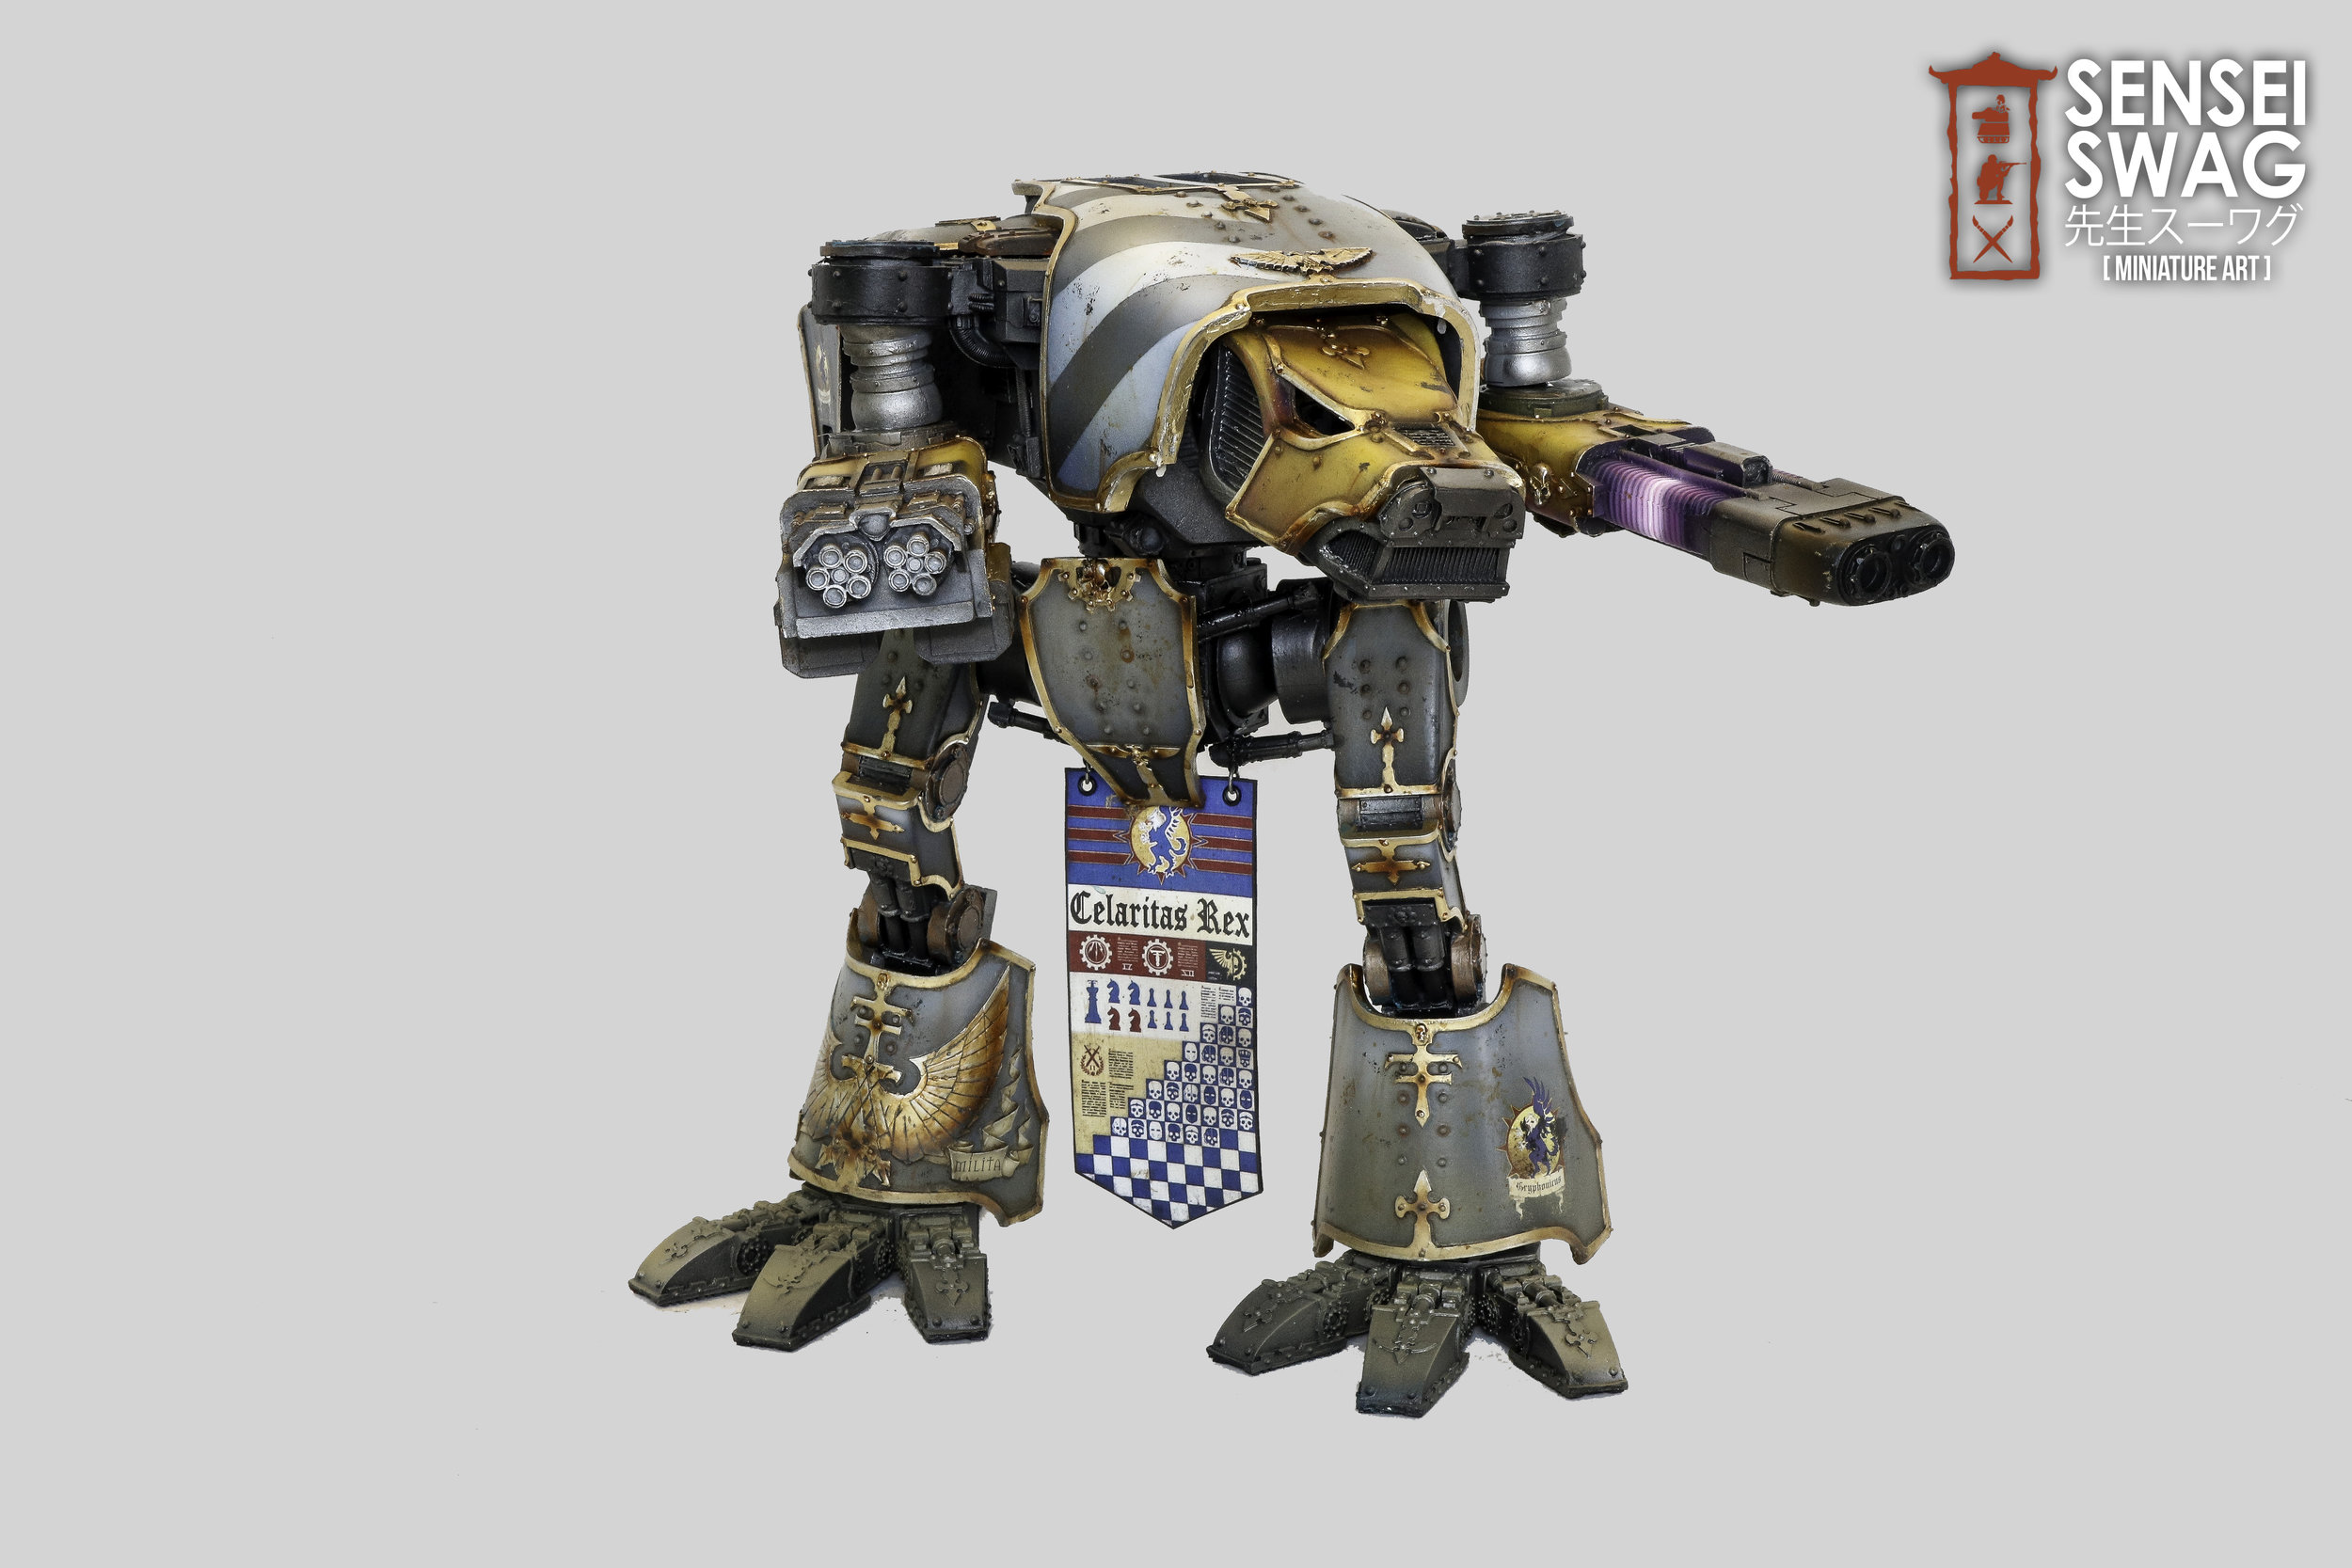 Watermark Legio Gryphonicus Titans Weathered Reaver Warhound-1.jpg